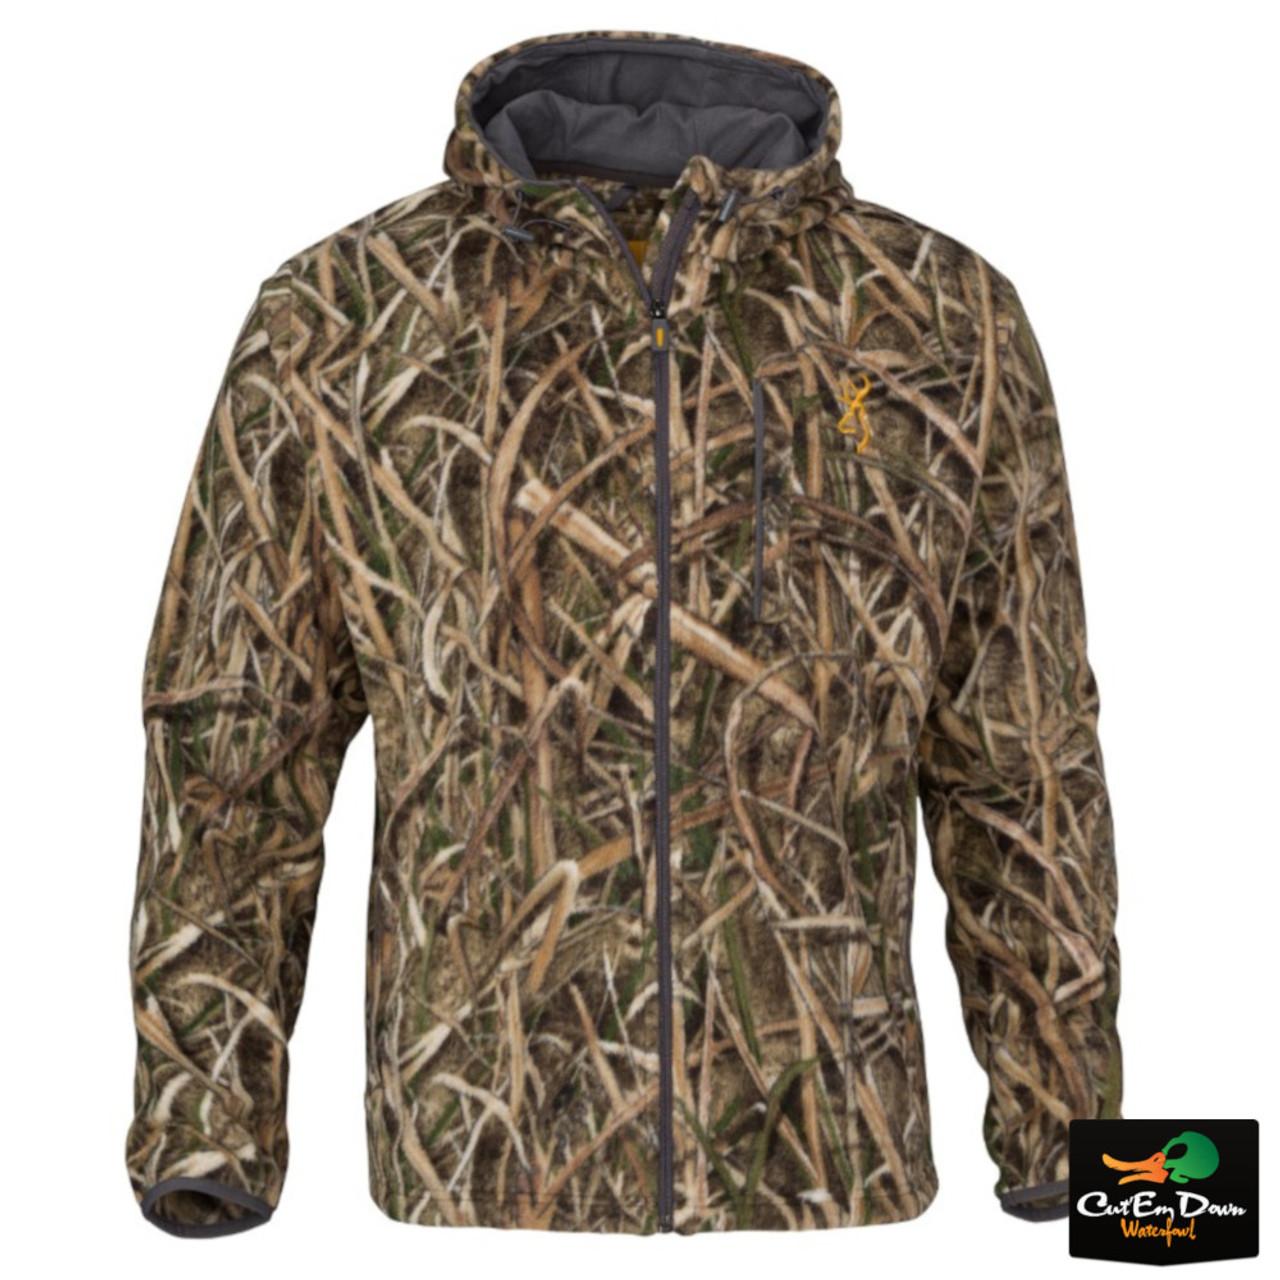 6a07a589c2eeb Browning Wasatch CB Fleece Jacket - Shadow Grass Blades